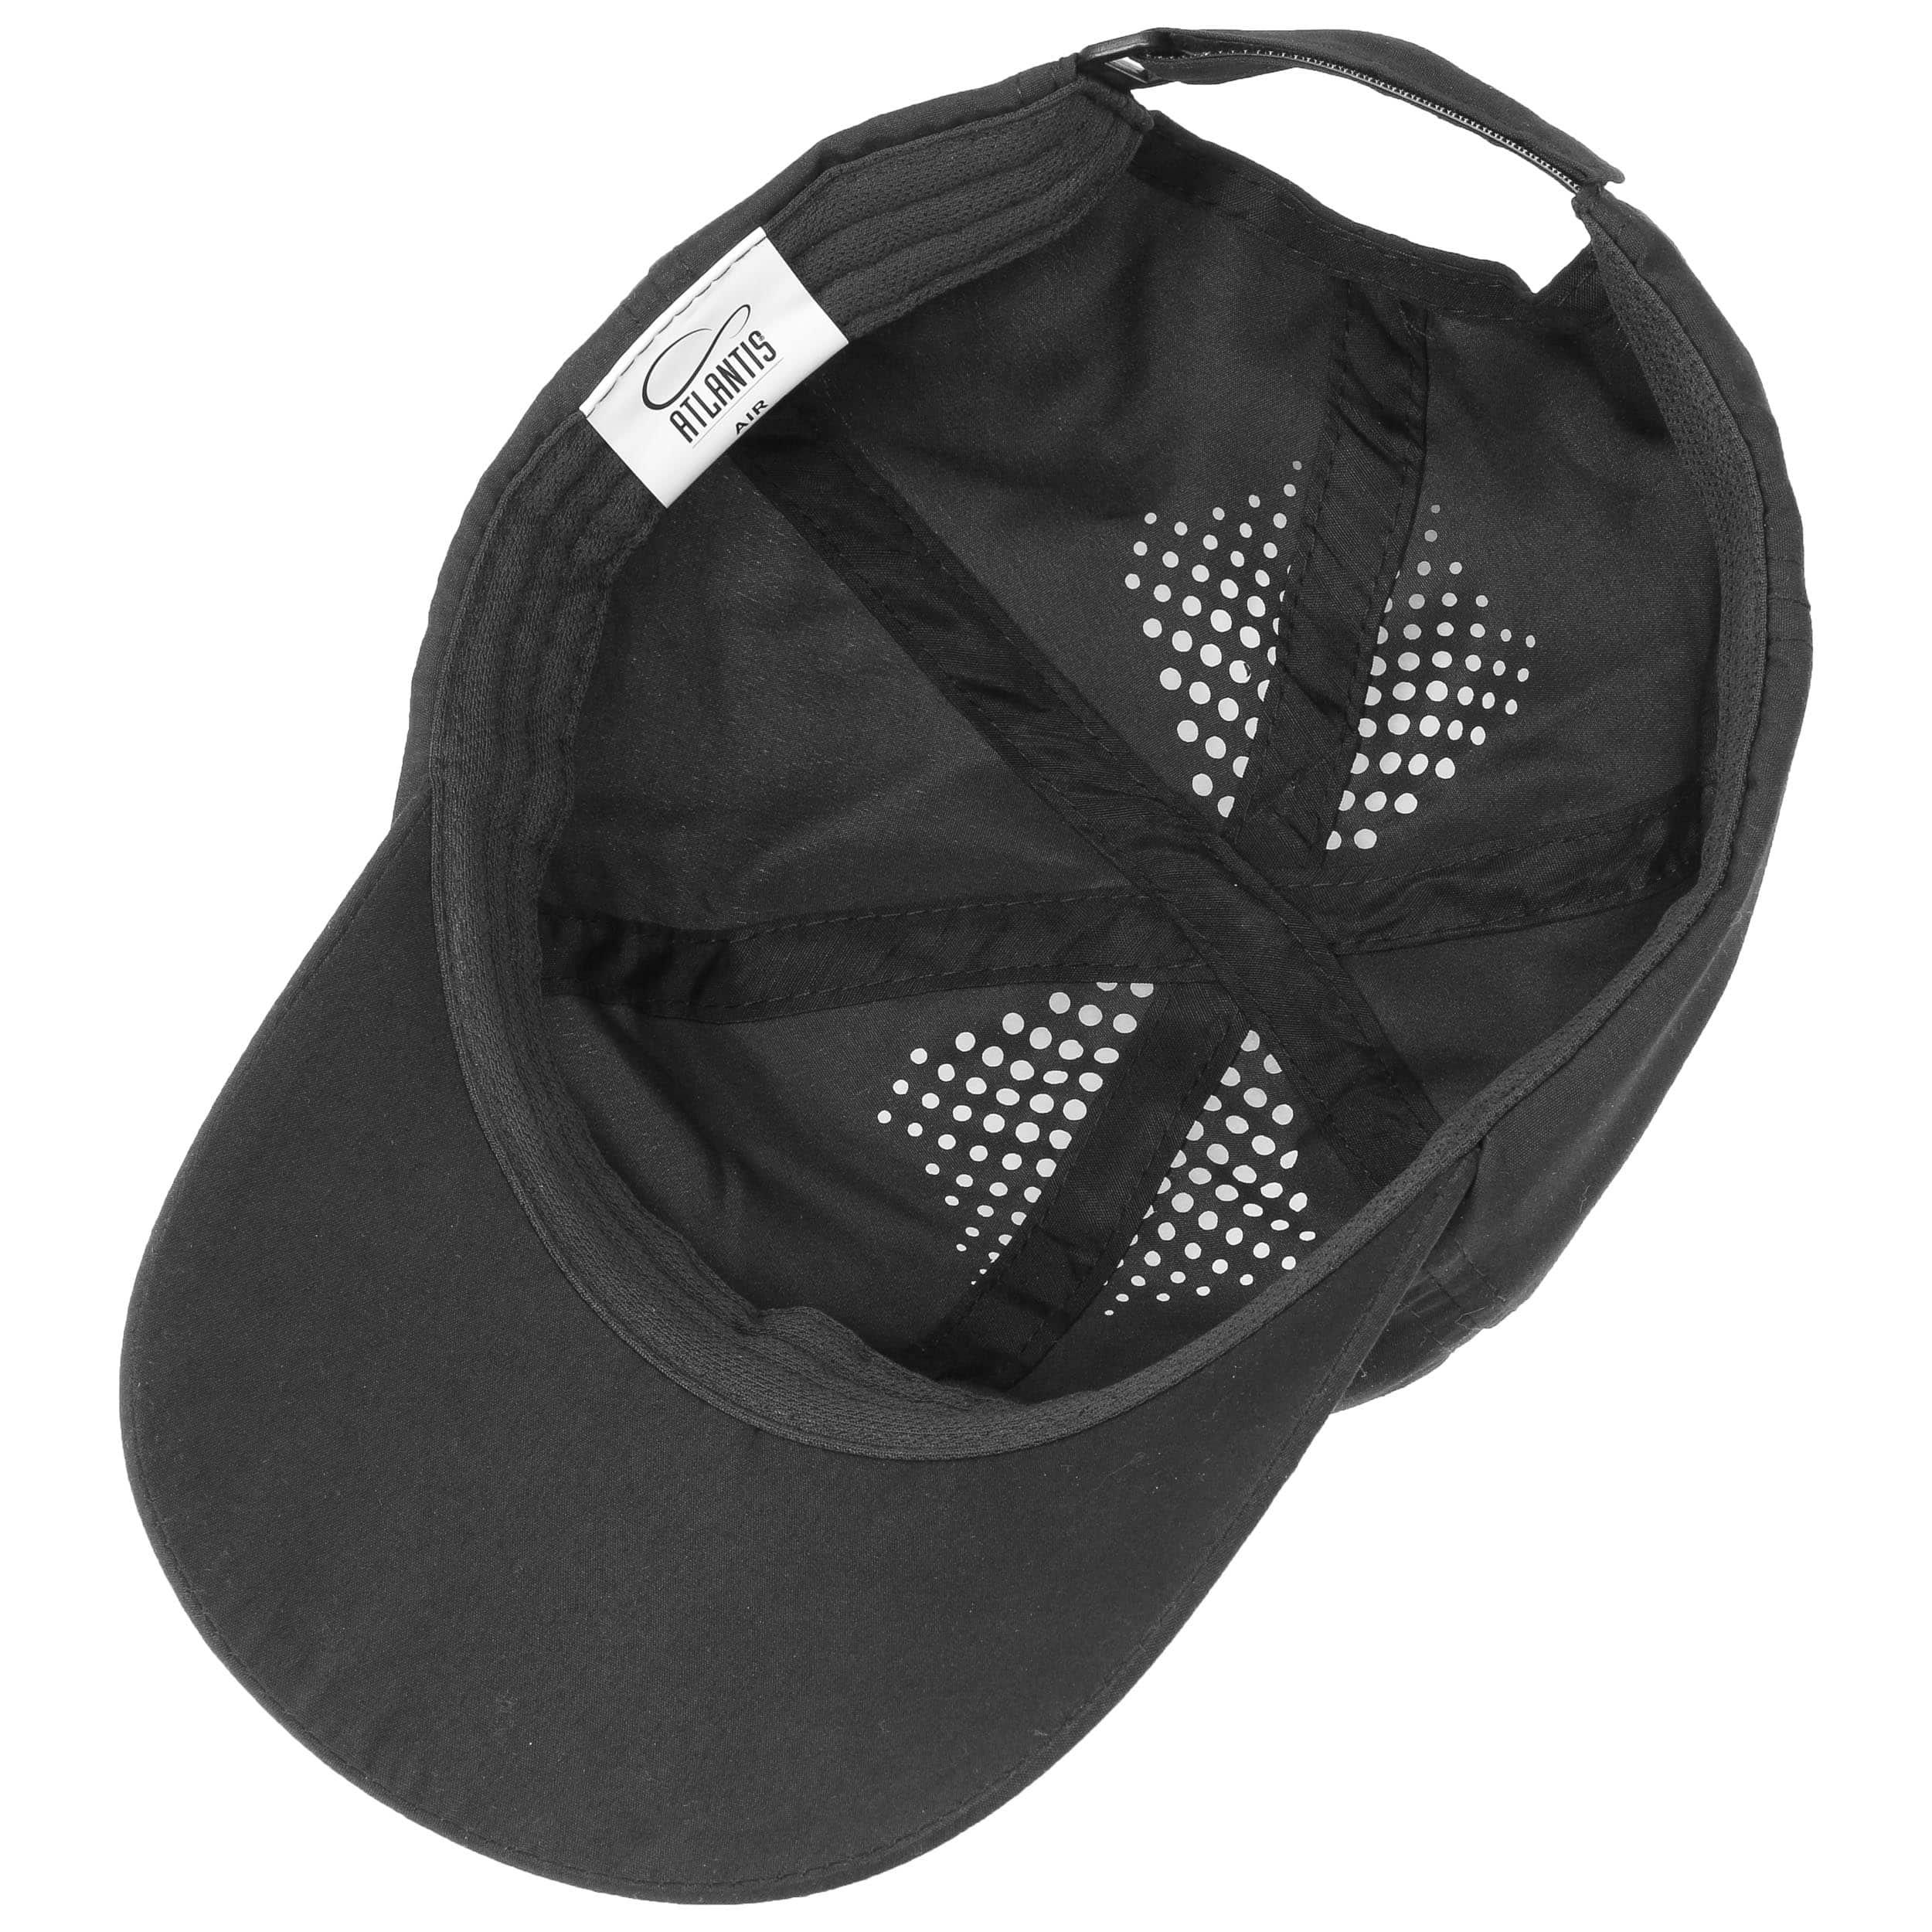 ... Vented Strapback Cap - black 2 ... 3717bd73bc1